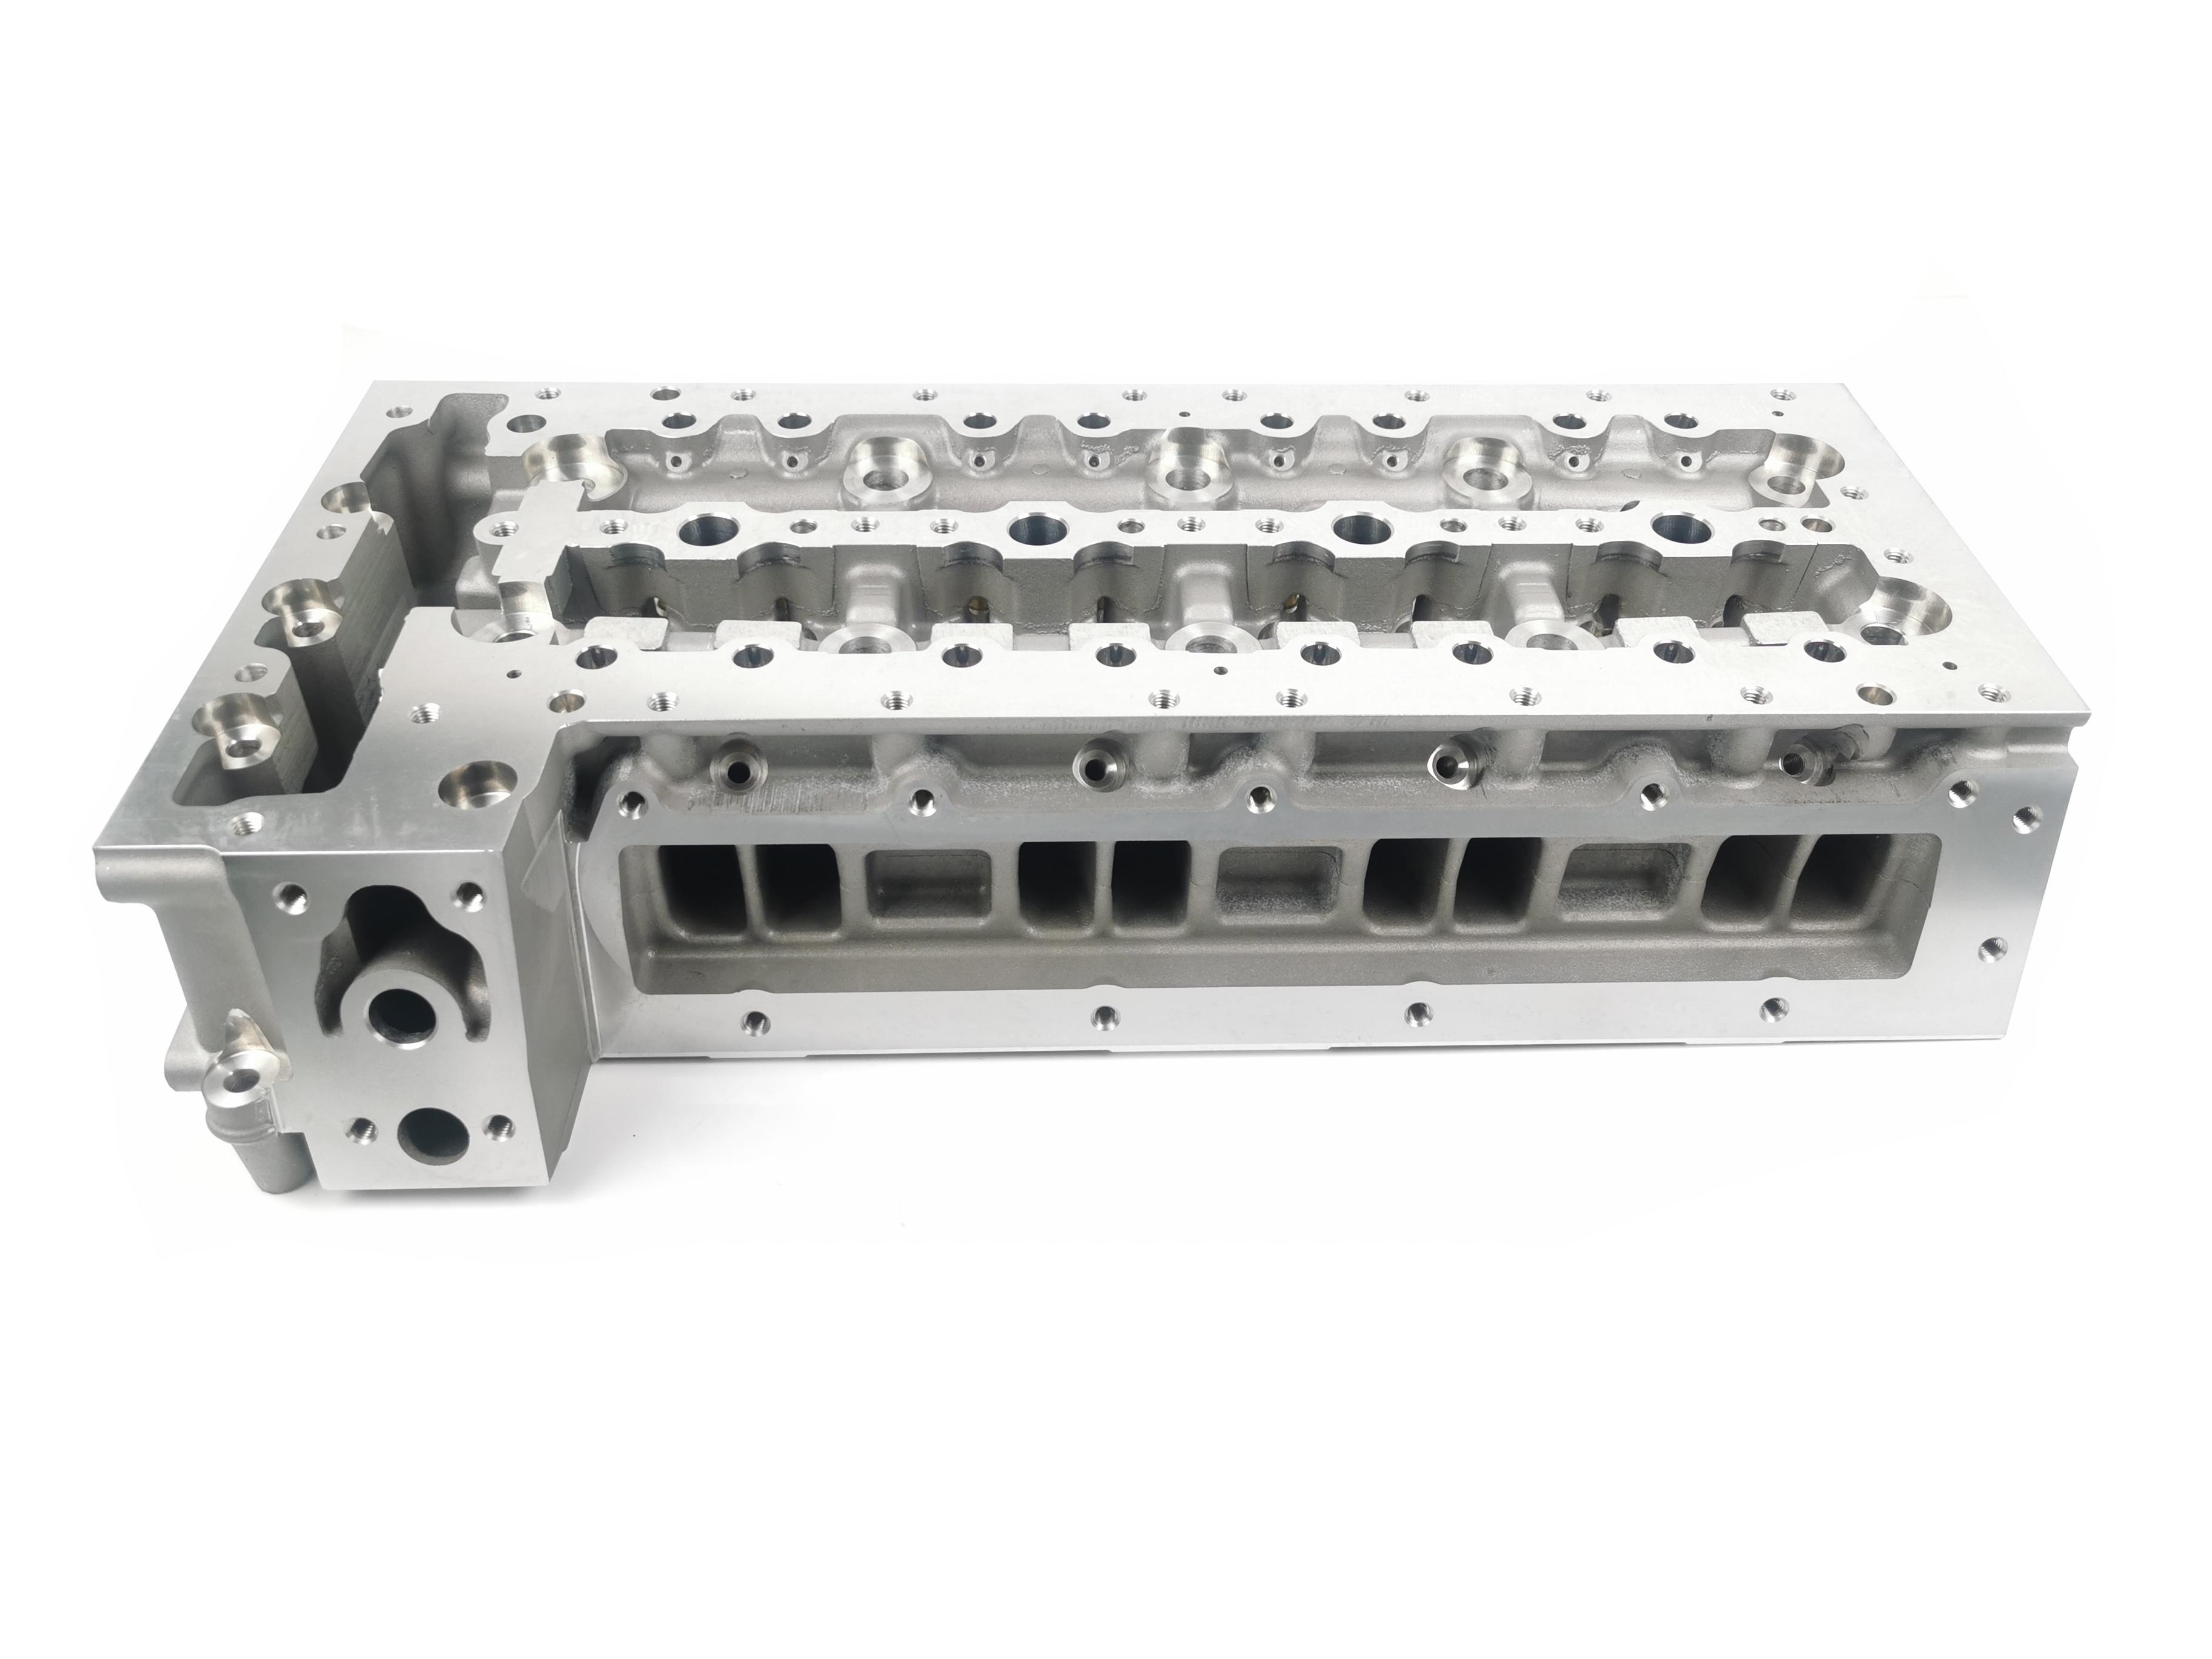 Zylinderkopf für Fiat Ducato 3,0 140 Natural Power CNG F1CE0441A 504278047 NEU